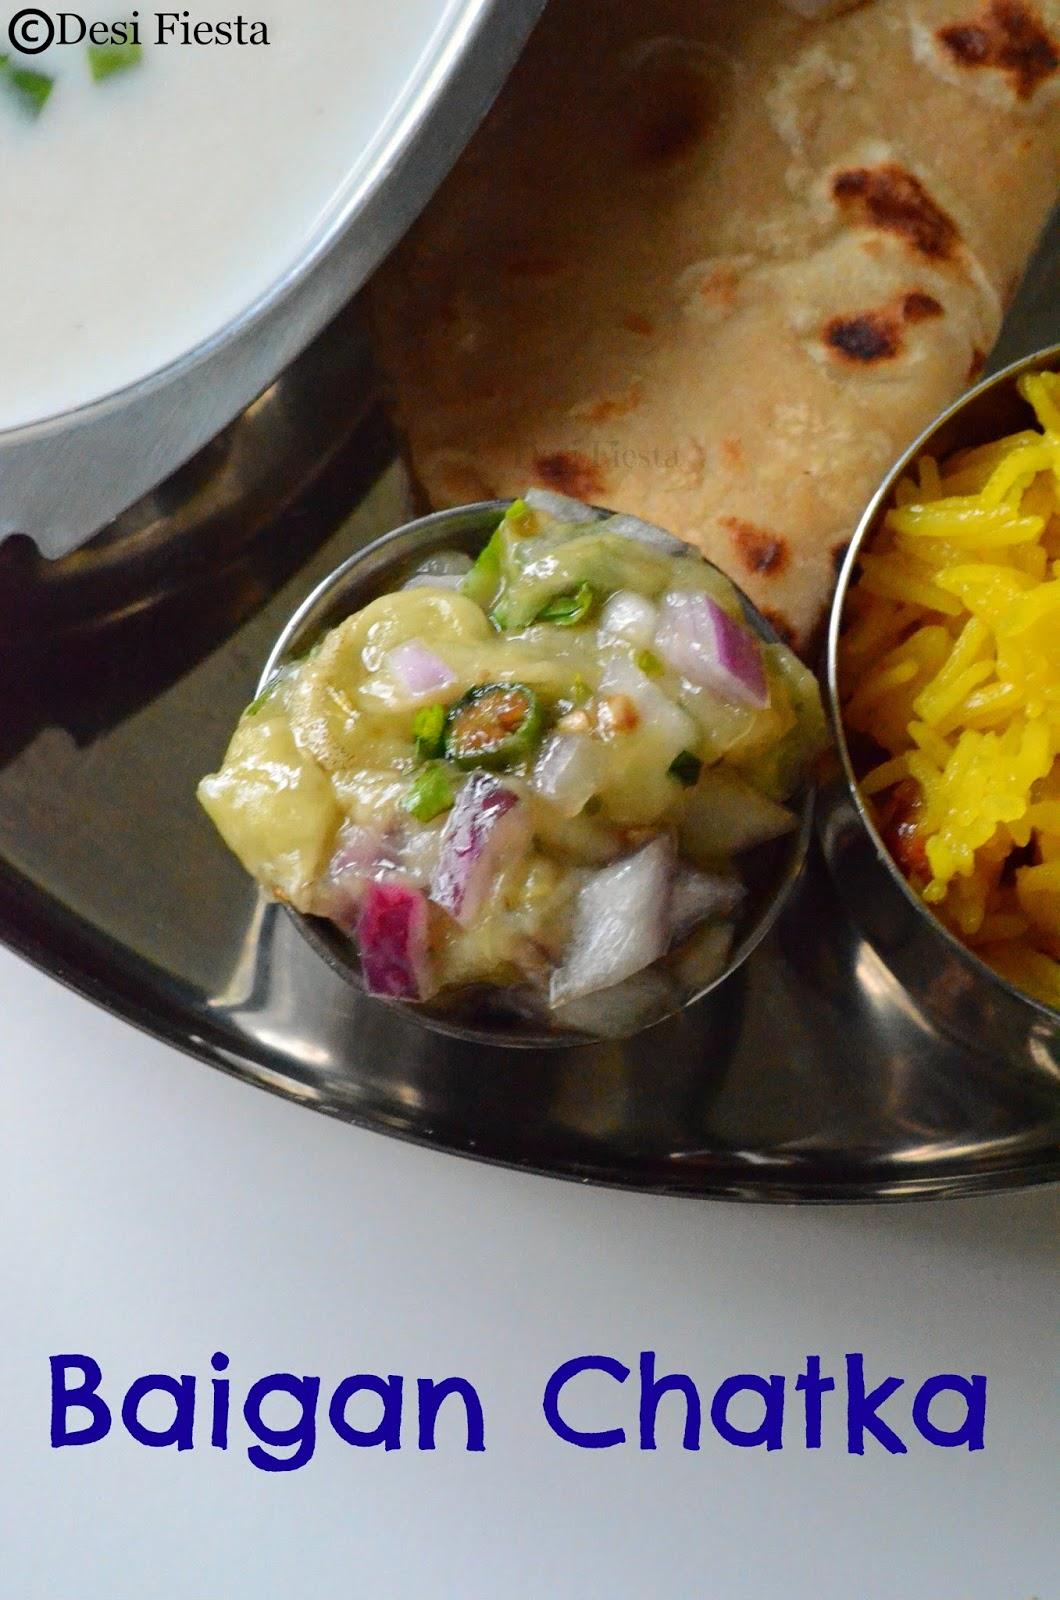 Oriya thali orissa cuisine desi fiesta orissa eggplant recipes forumfinder Image collections